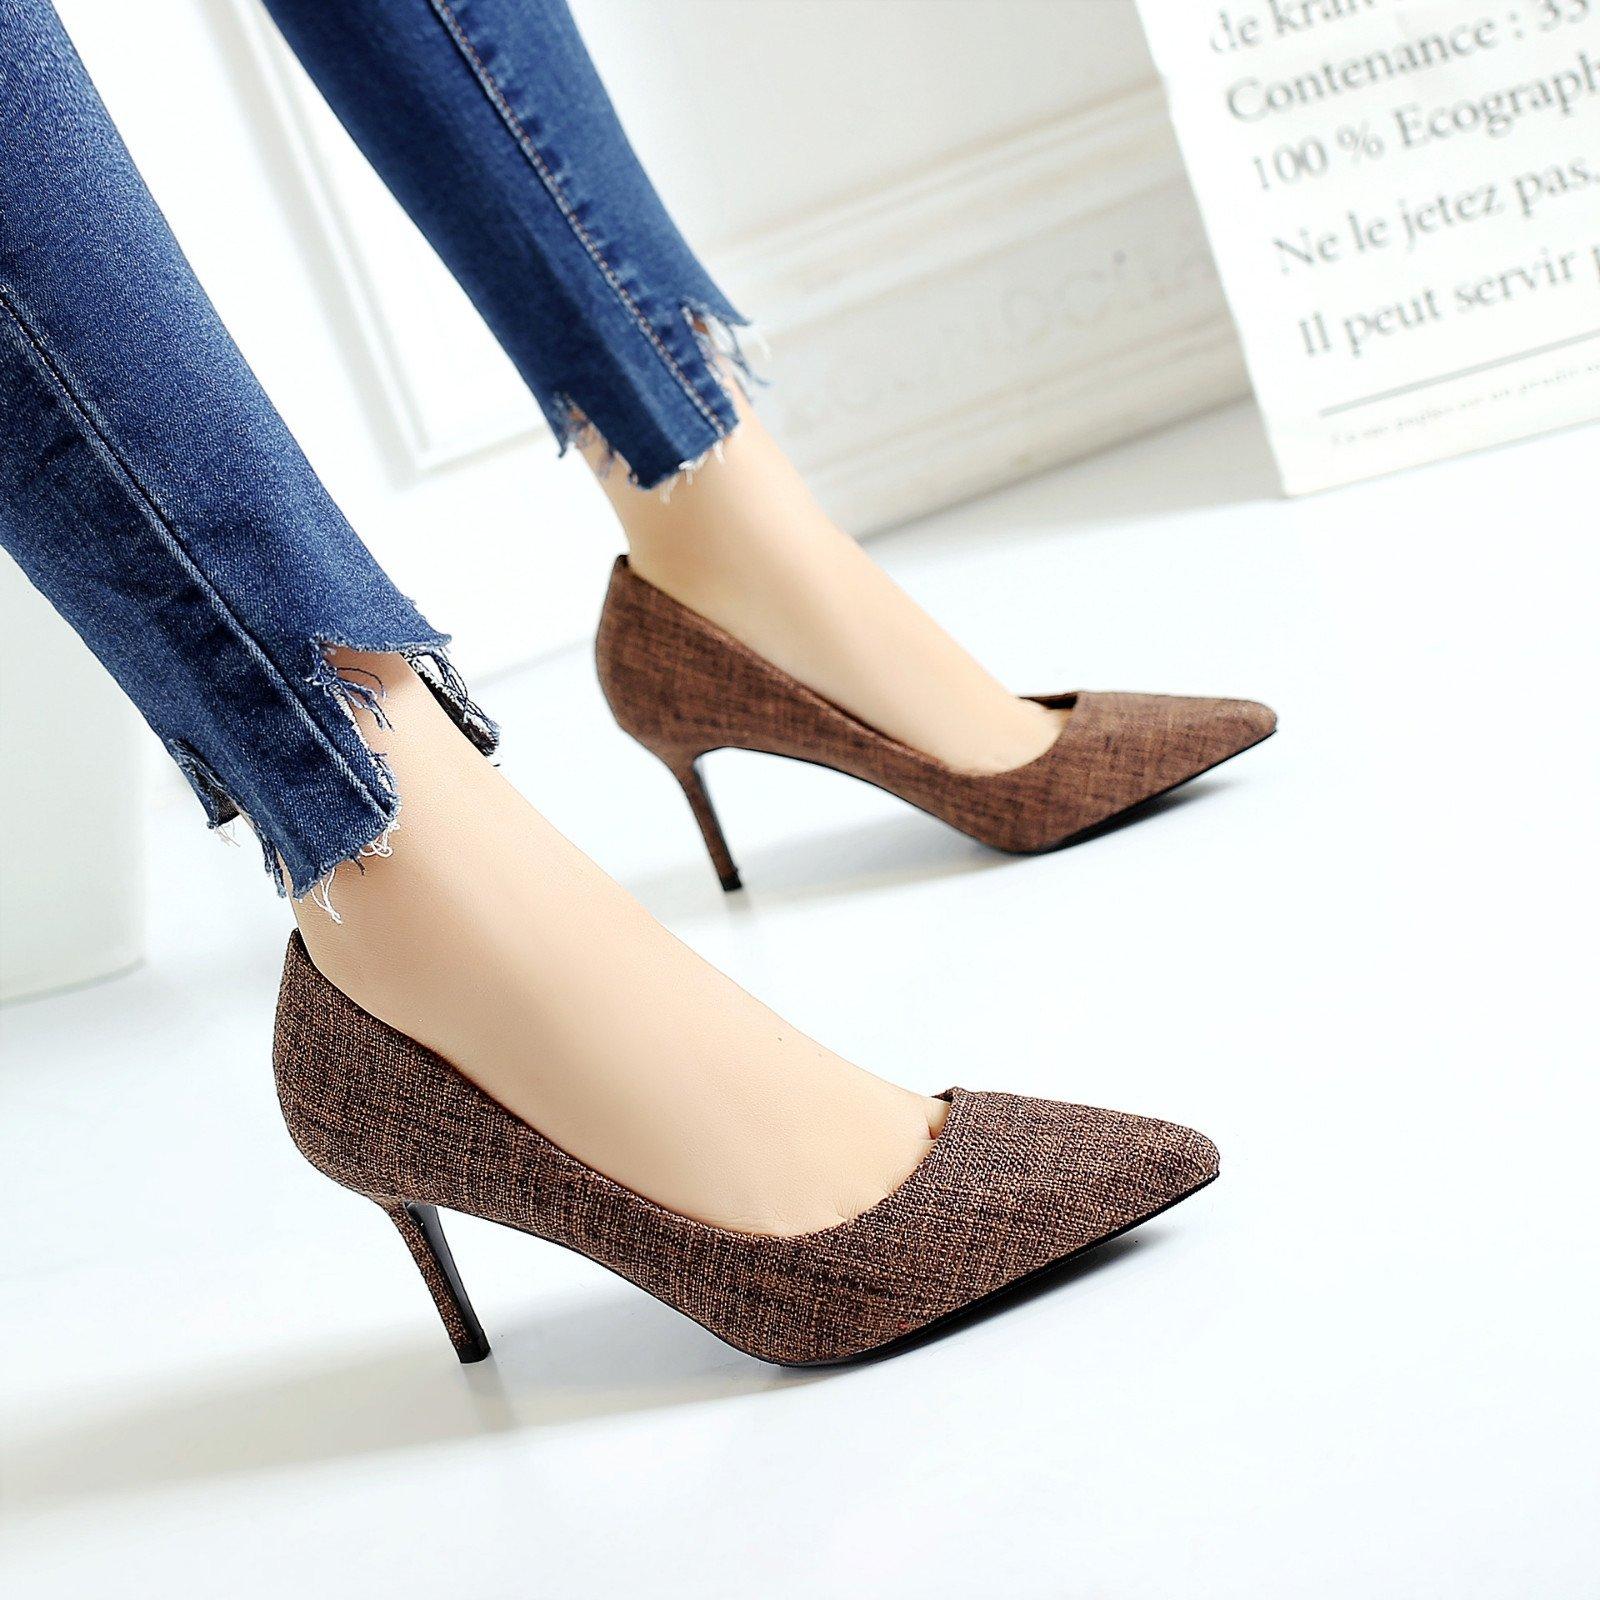 High heel shoe tip burlap fine with high heel temperament shallow mouth, khaki, 34 by YLSZ-High heels (Image #2)